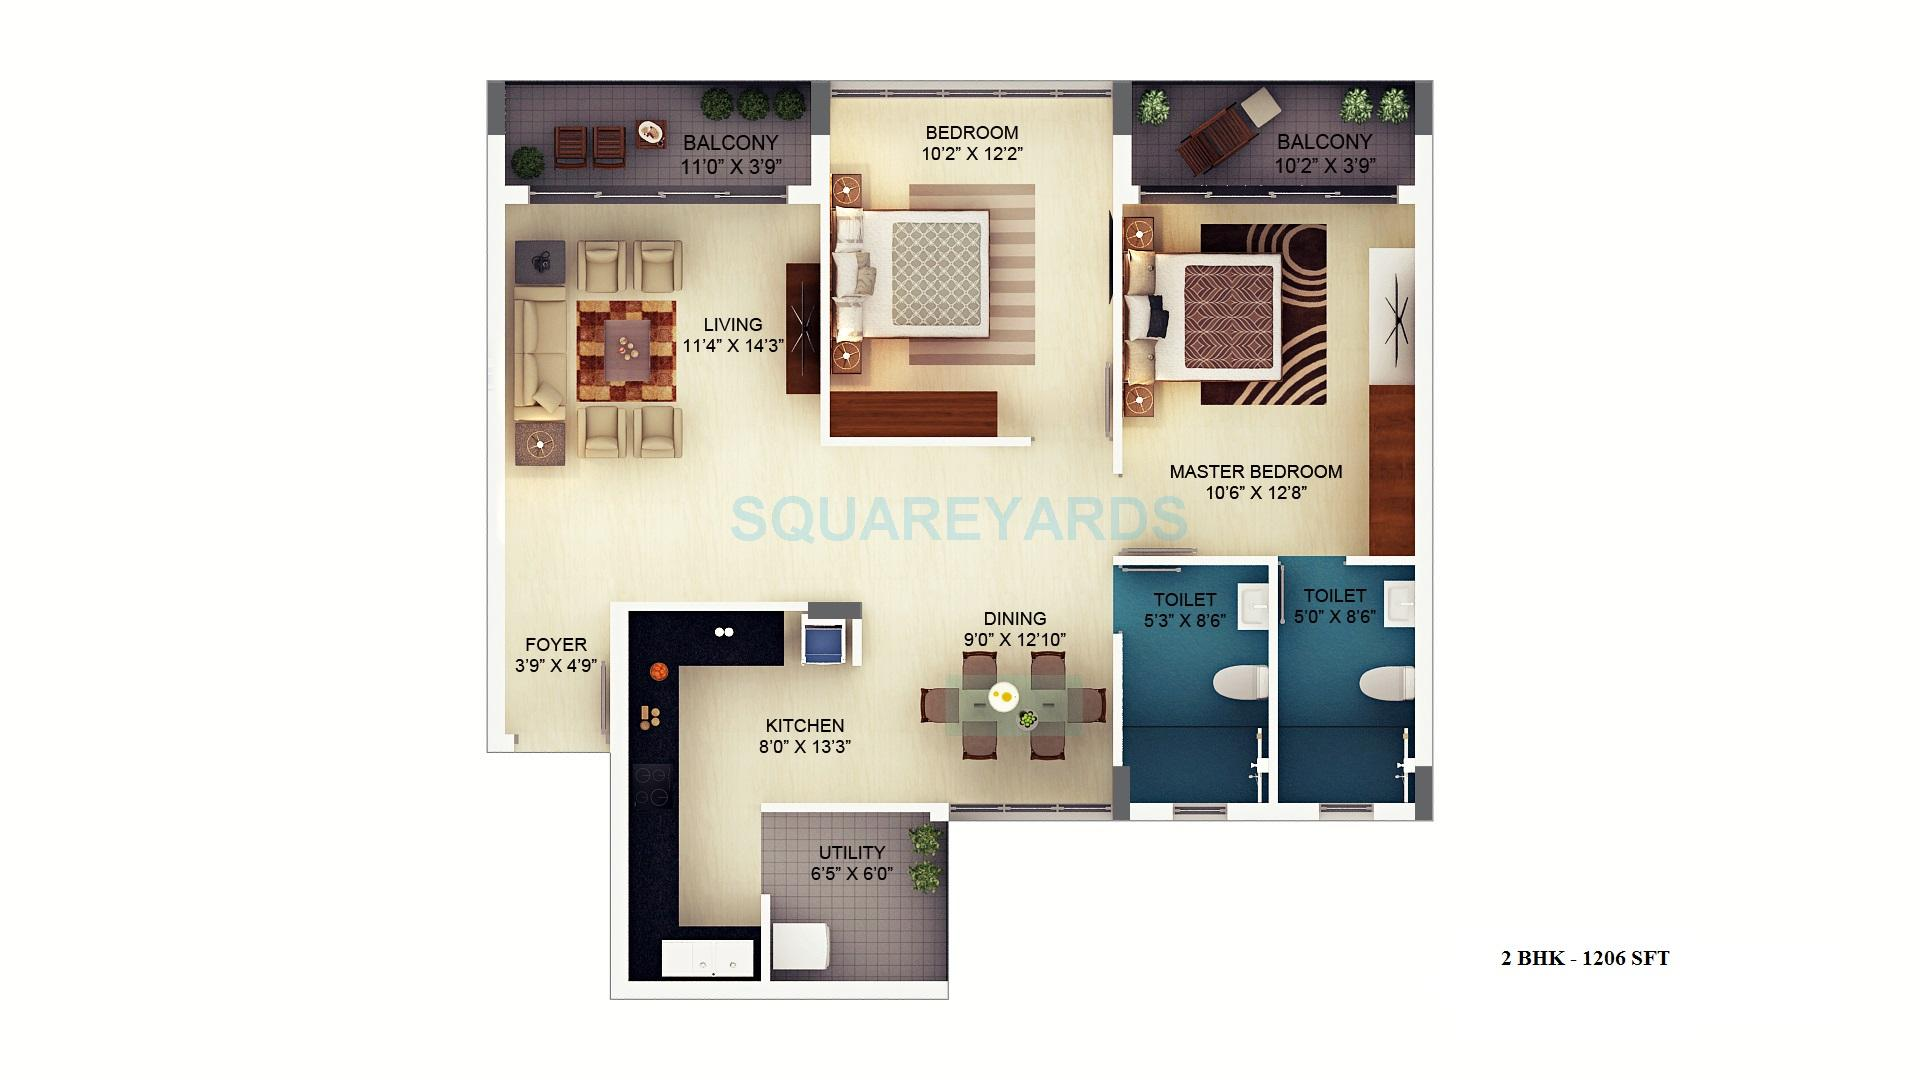 sjr primecorp mayfair residences apartment 2bhk 1206sqft1